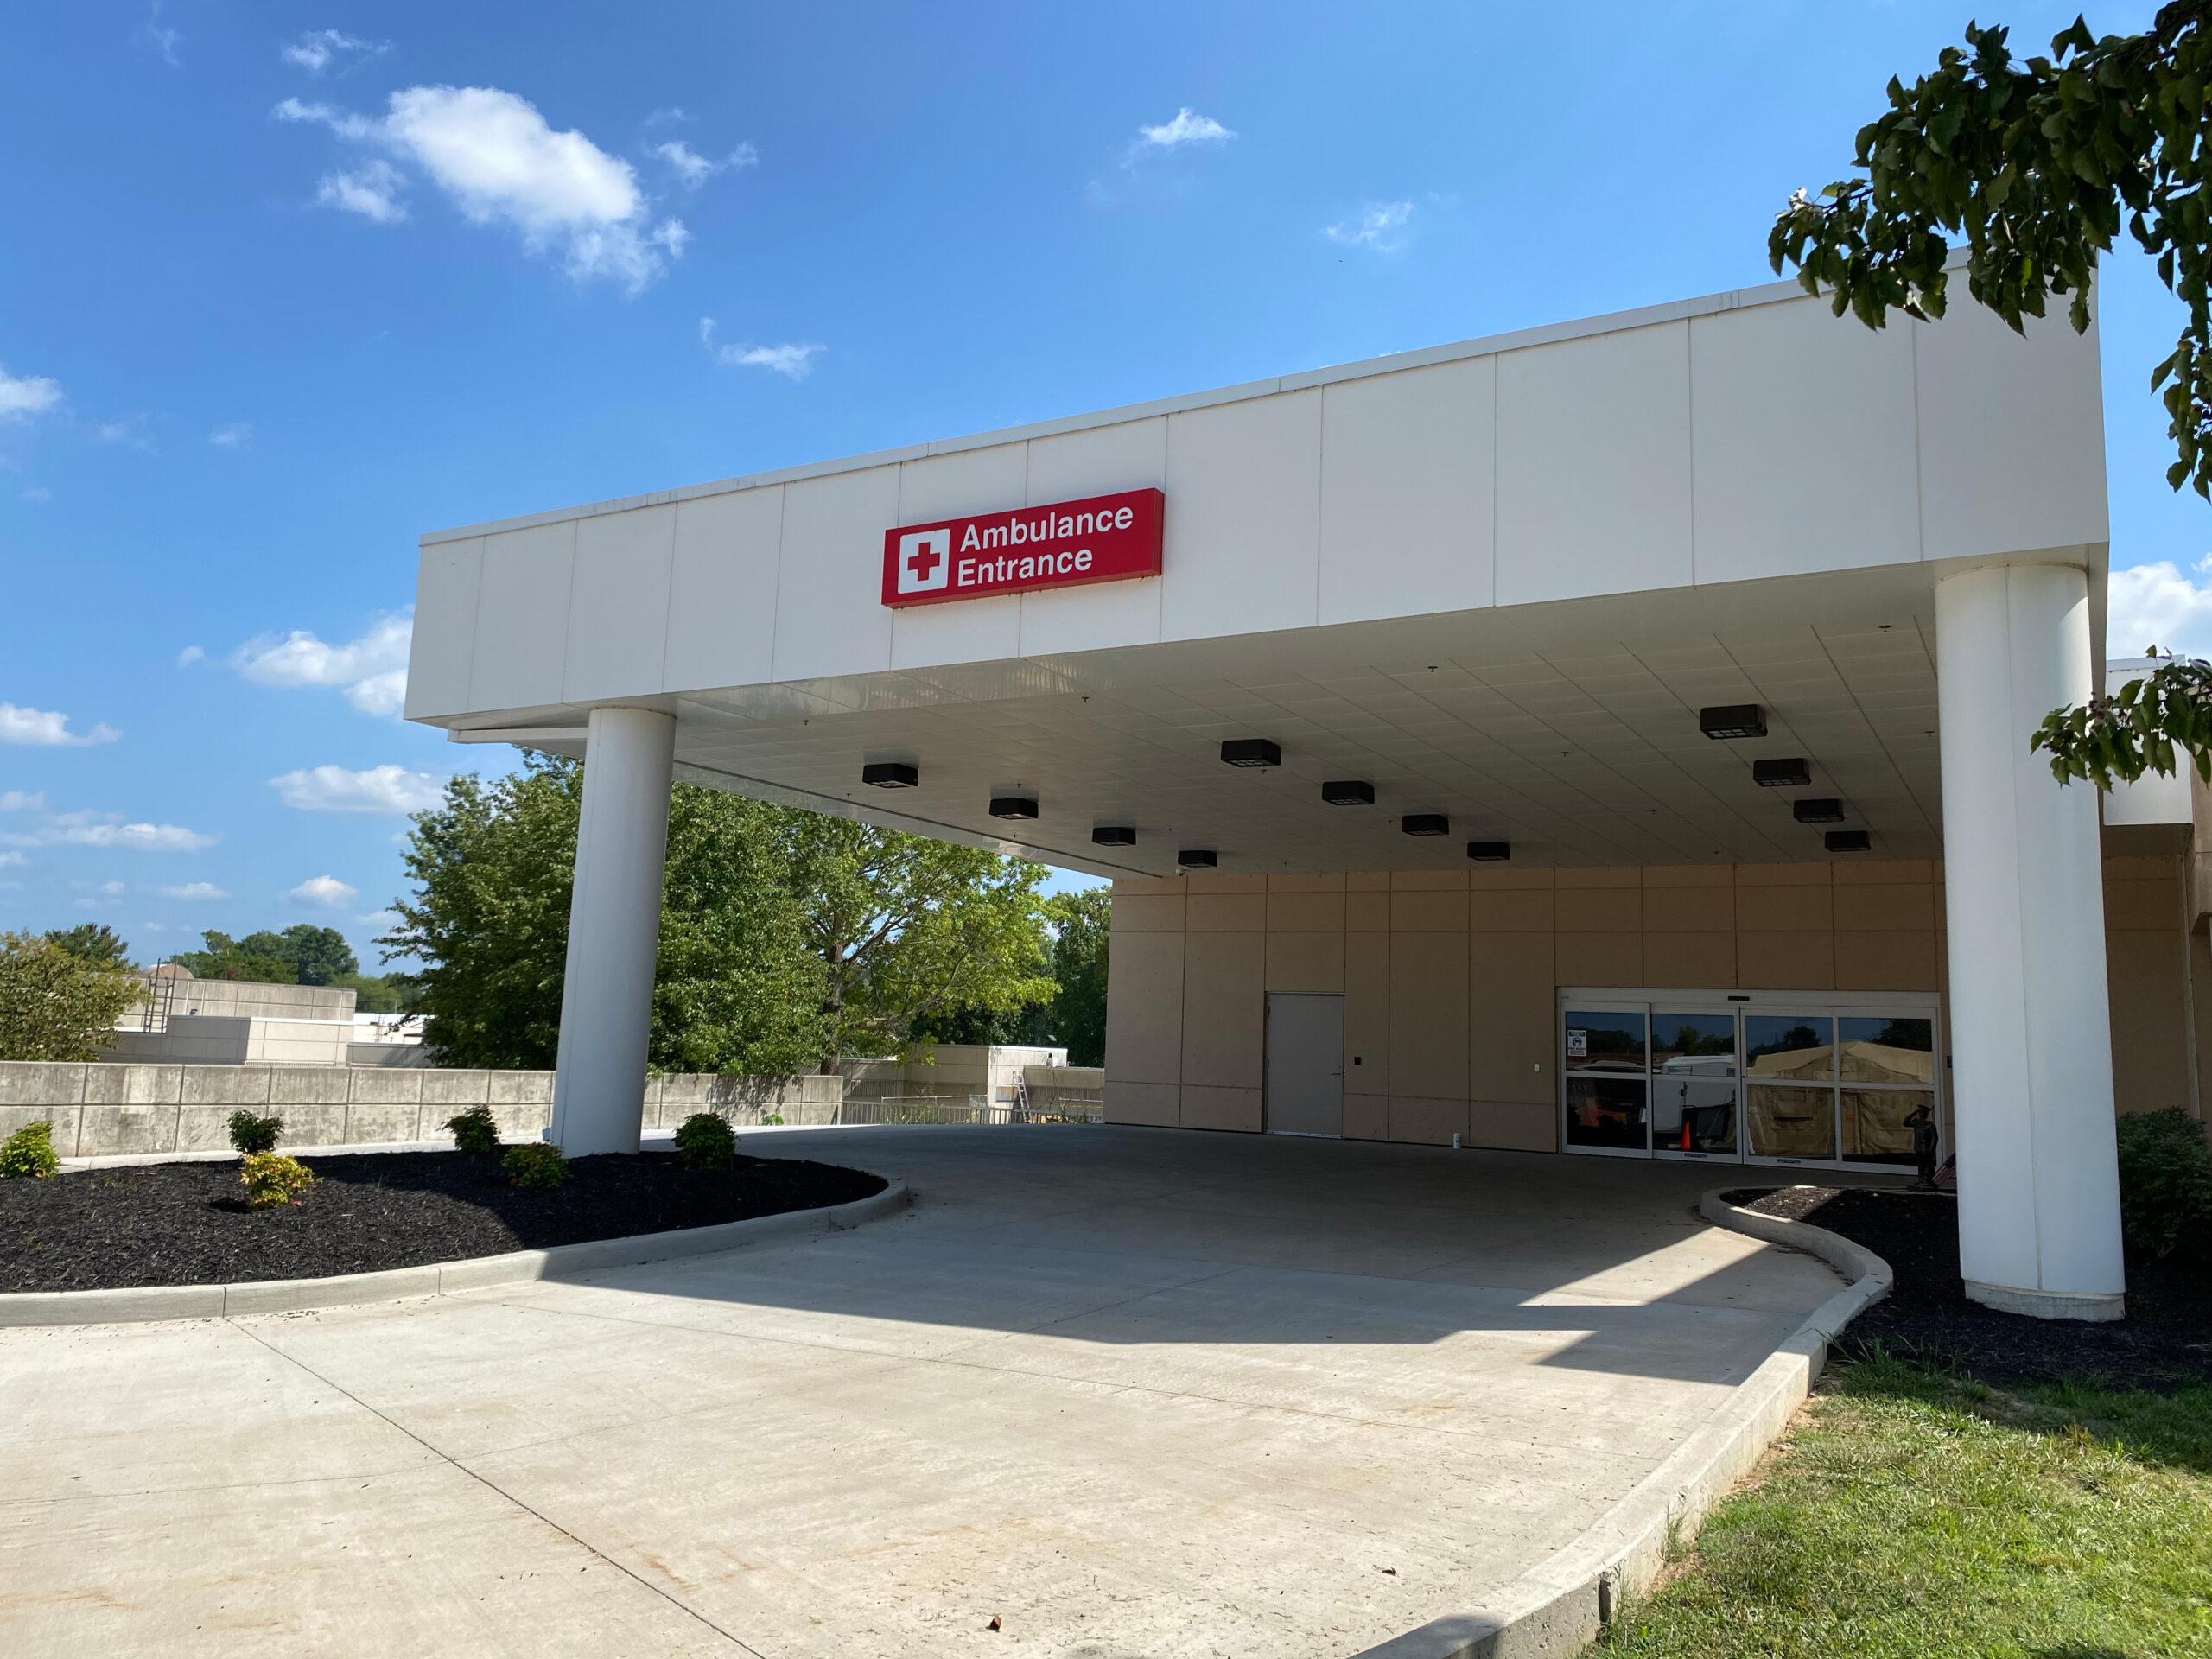 MO Project Outdoor Ambulance Entrance